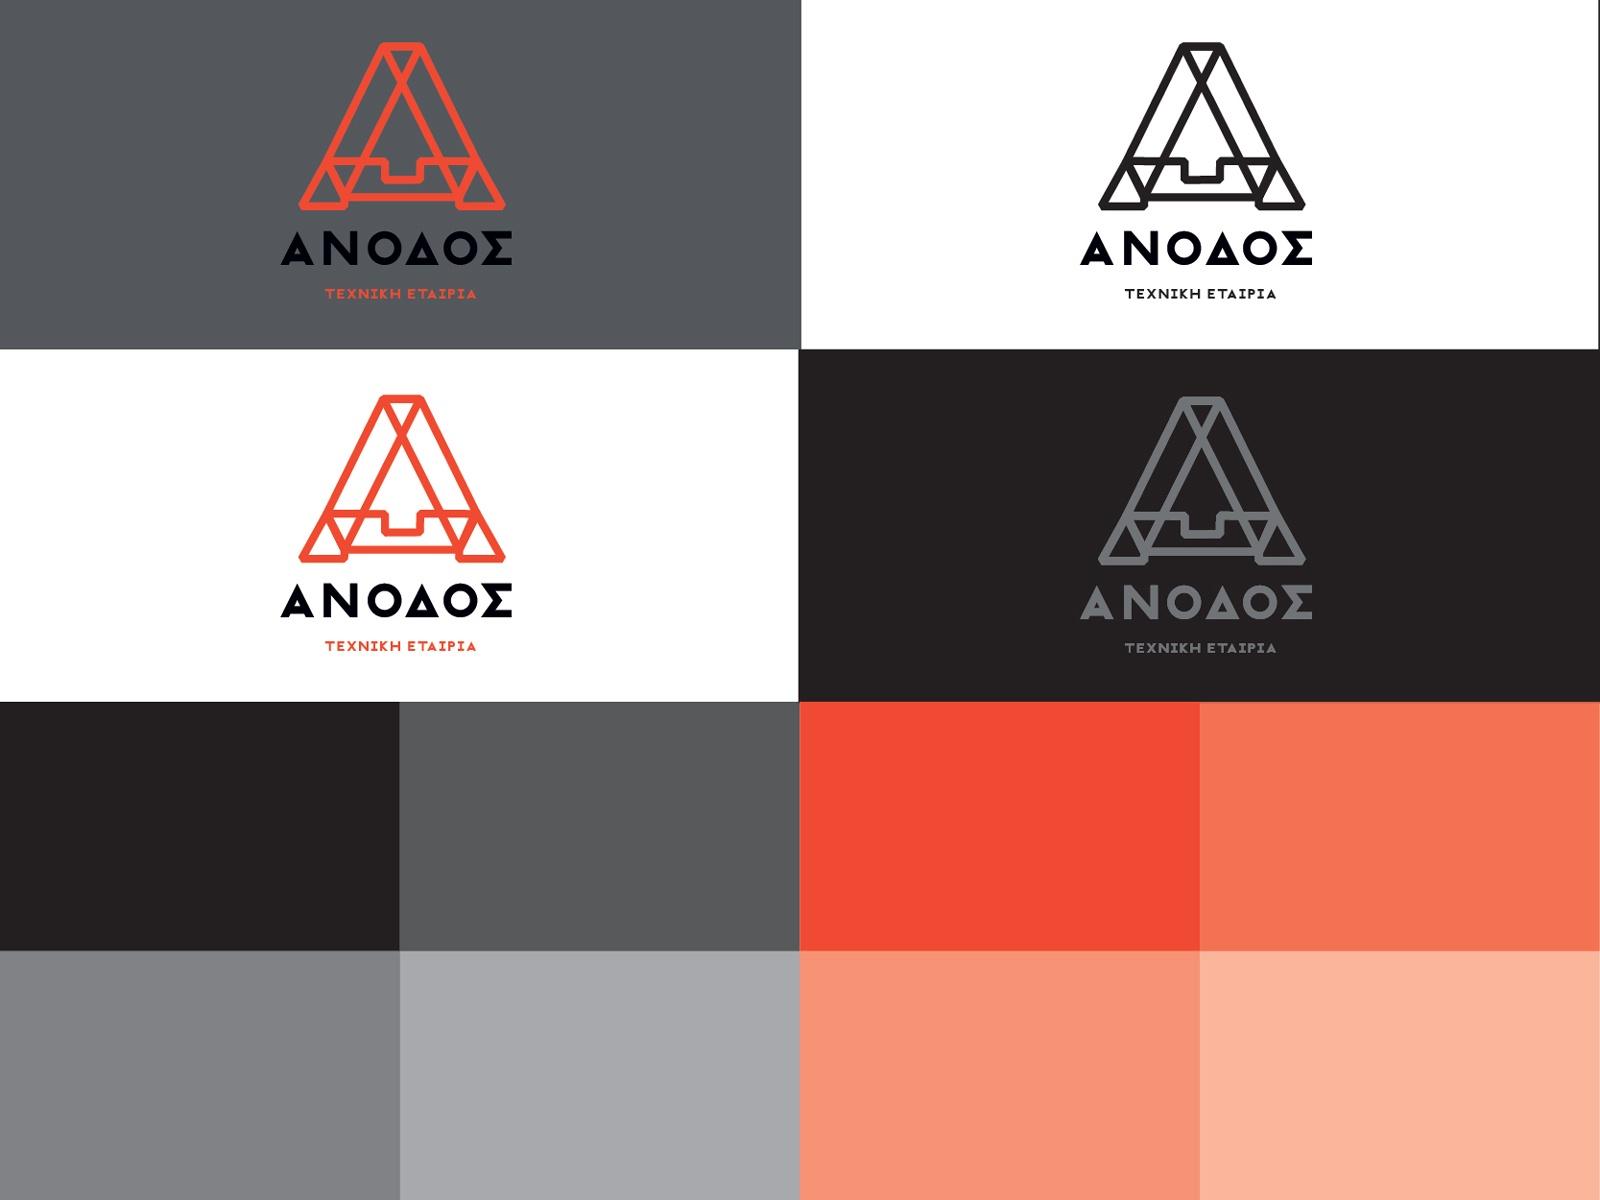 Anodos_Presentation-1_2-03